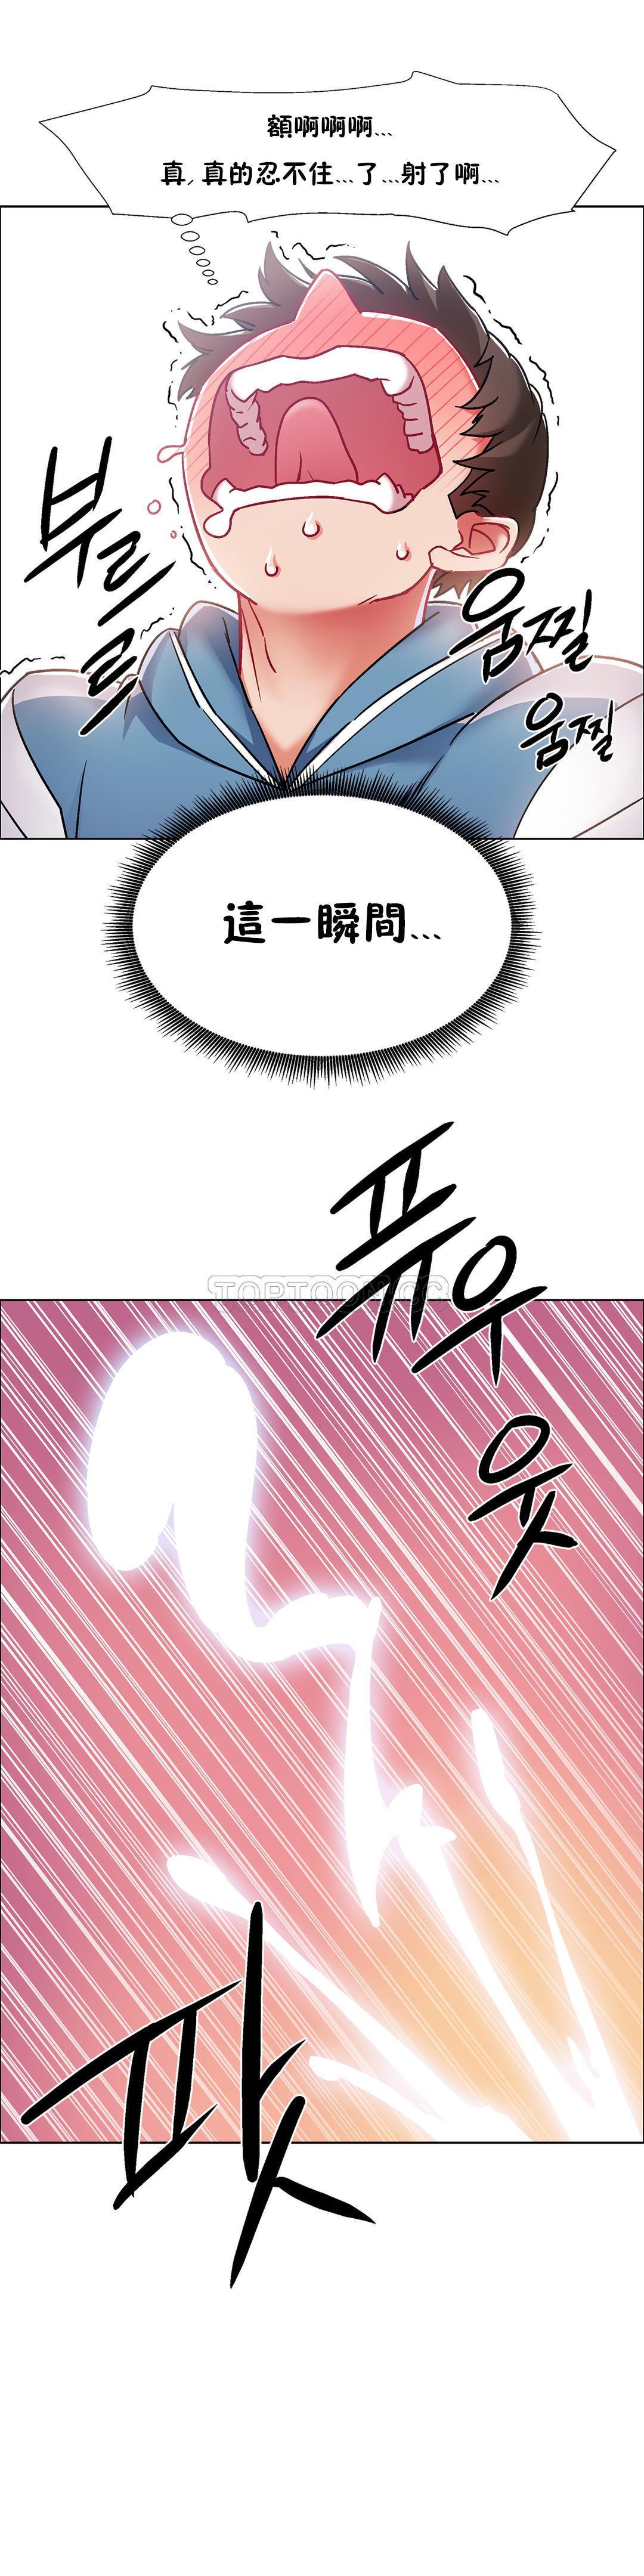 [Studio Wannabe] Rental Girls | 出租女郎 Ch. 33-58 [Chinese]  第二季 完结 118